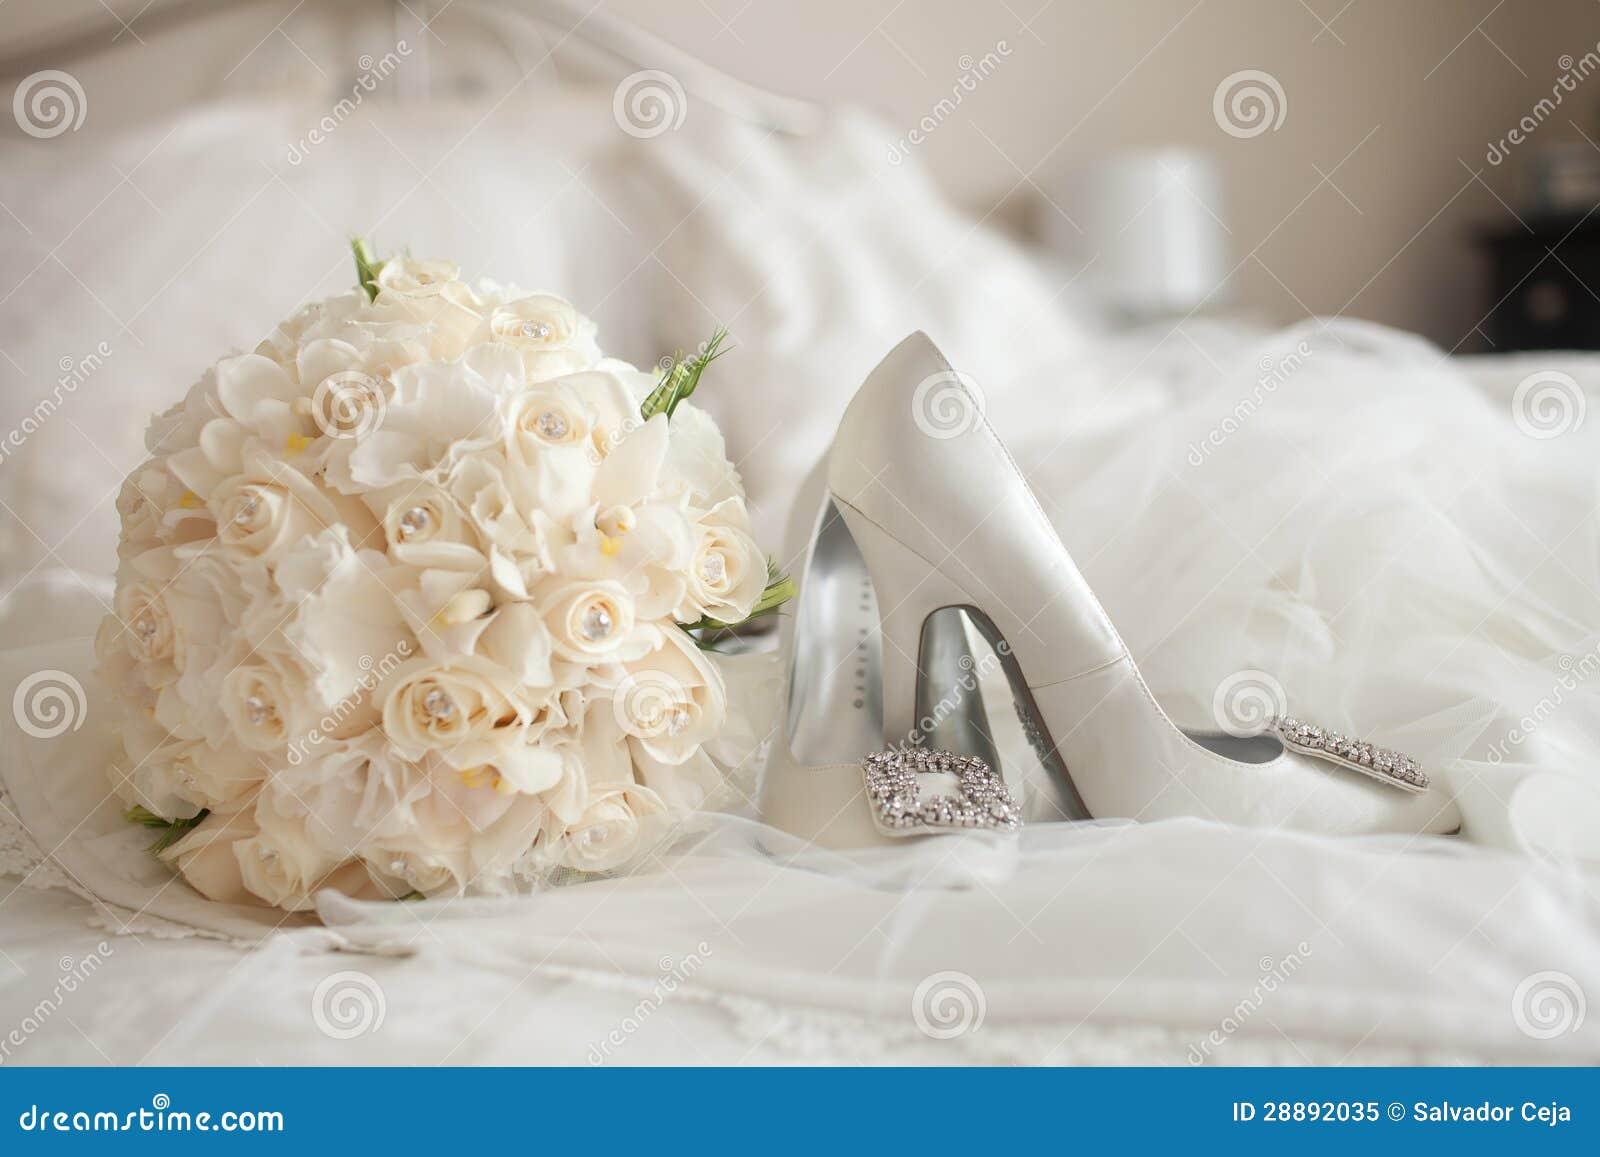 wedding stock photos 928 104 images